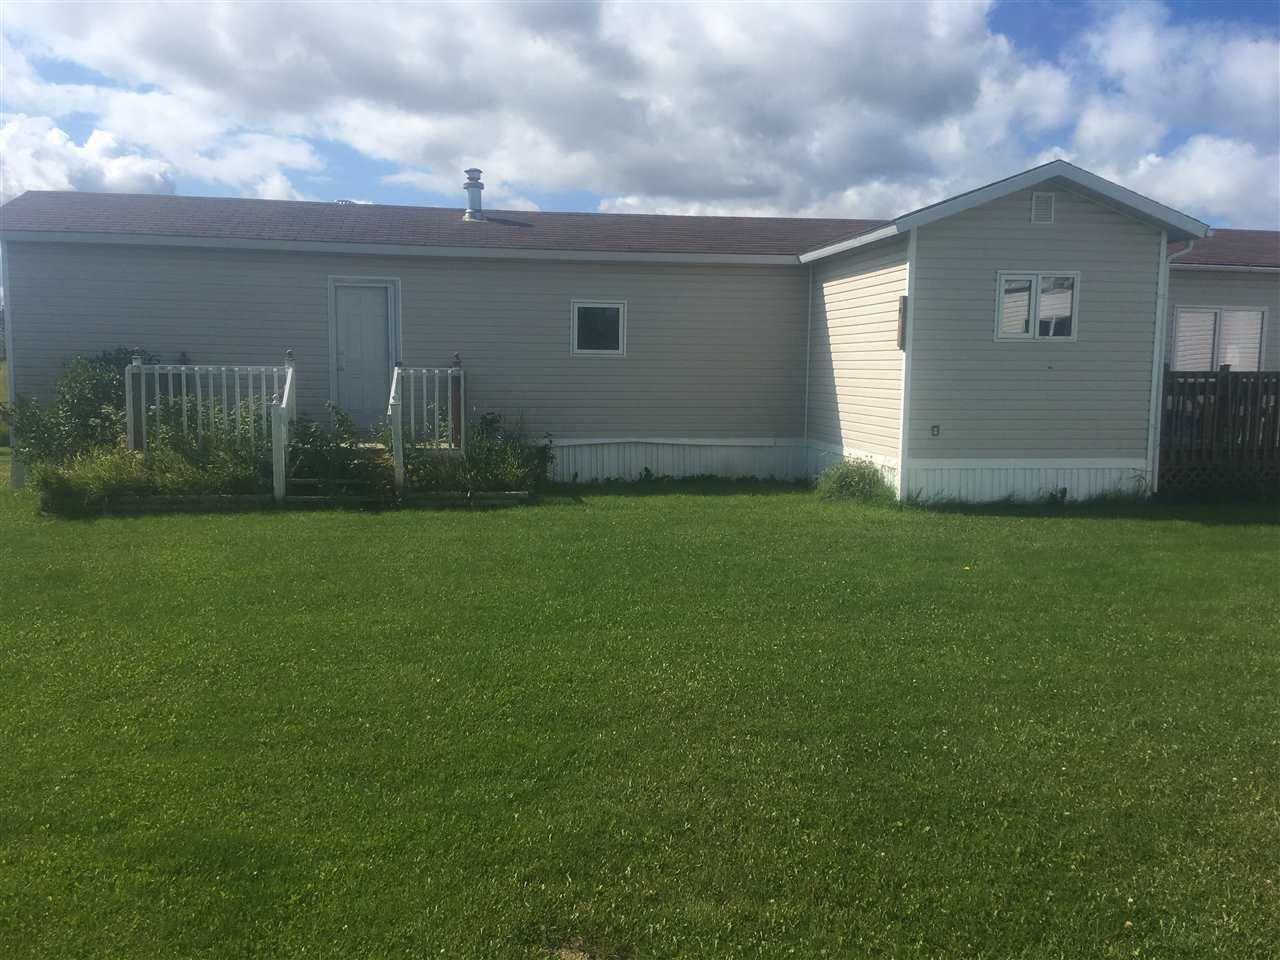 "Main Photo: 164 9207 82 Street in Fort St. John: Fort St. John - City SE Manufactured Home for sale in ""SOUTHRIDGE"" (Fort St. John (Zone 60))  : MLS®# R2441187"